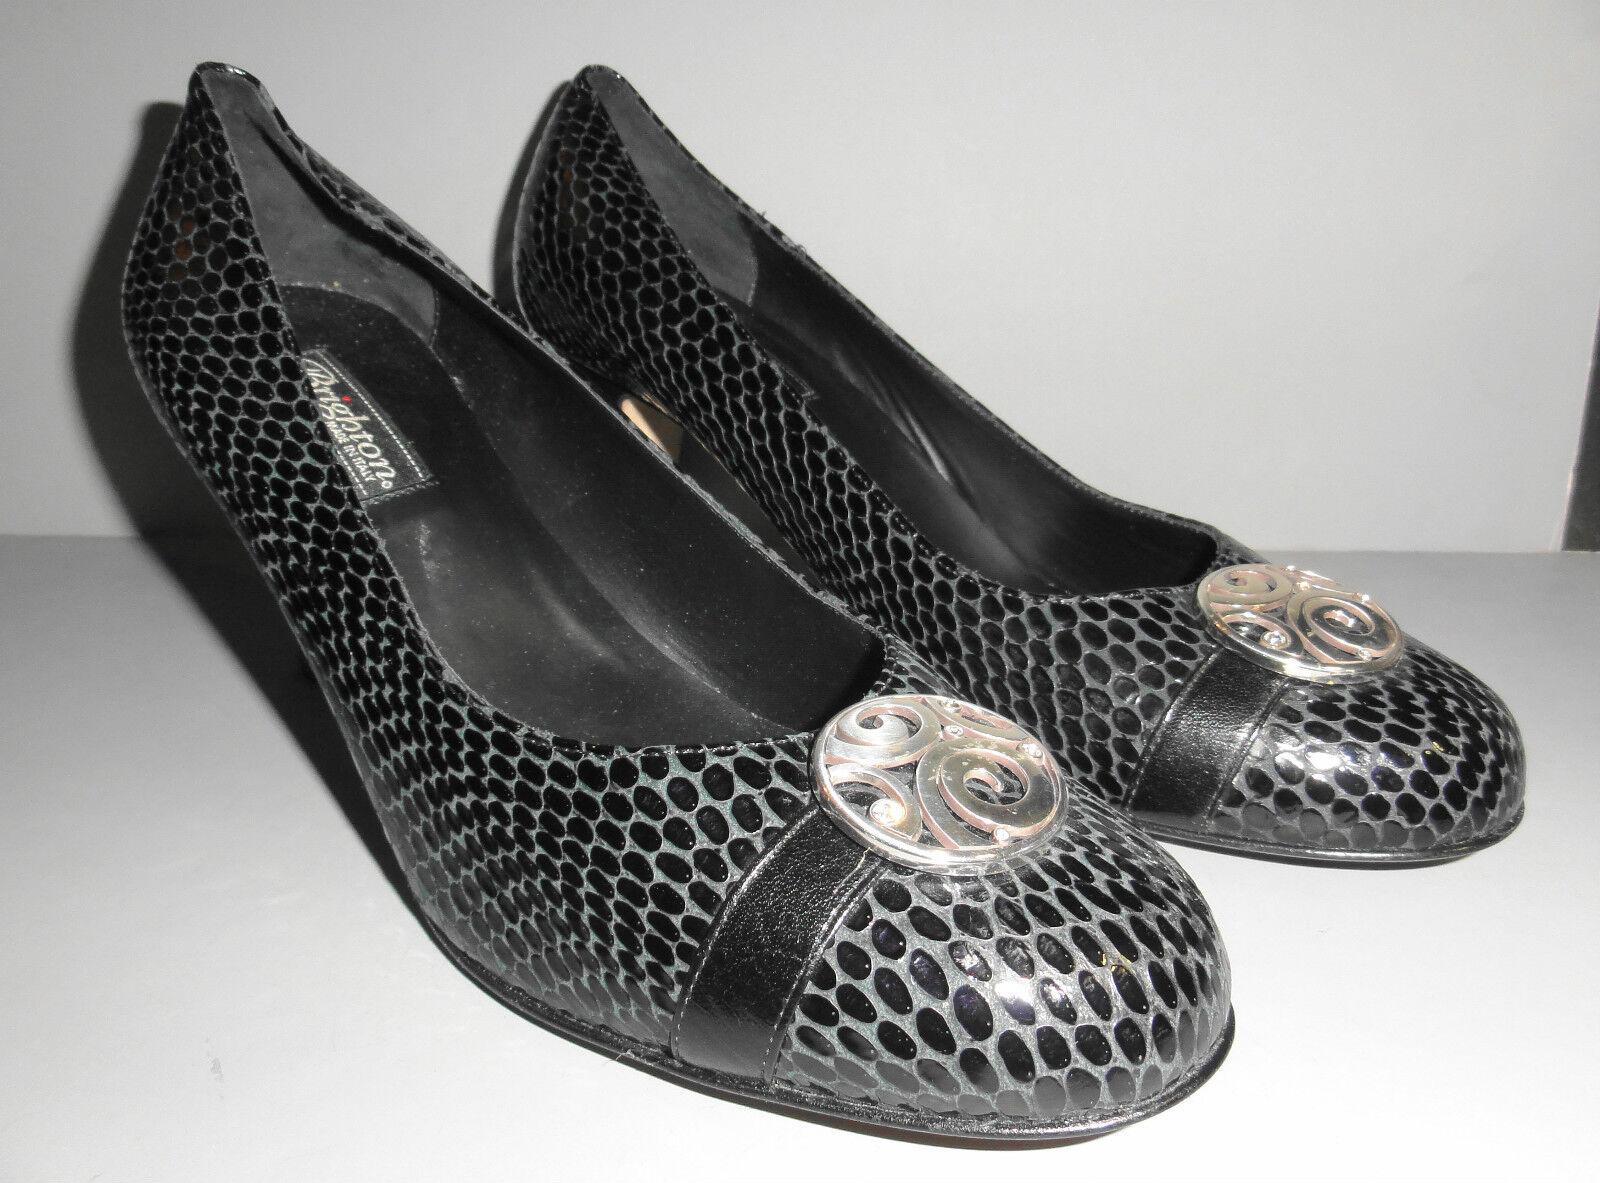 Brighton Made in  cuir noir talon haut femmes chaussures Blaze Serpent Motif